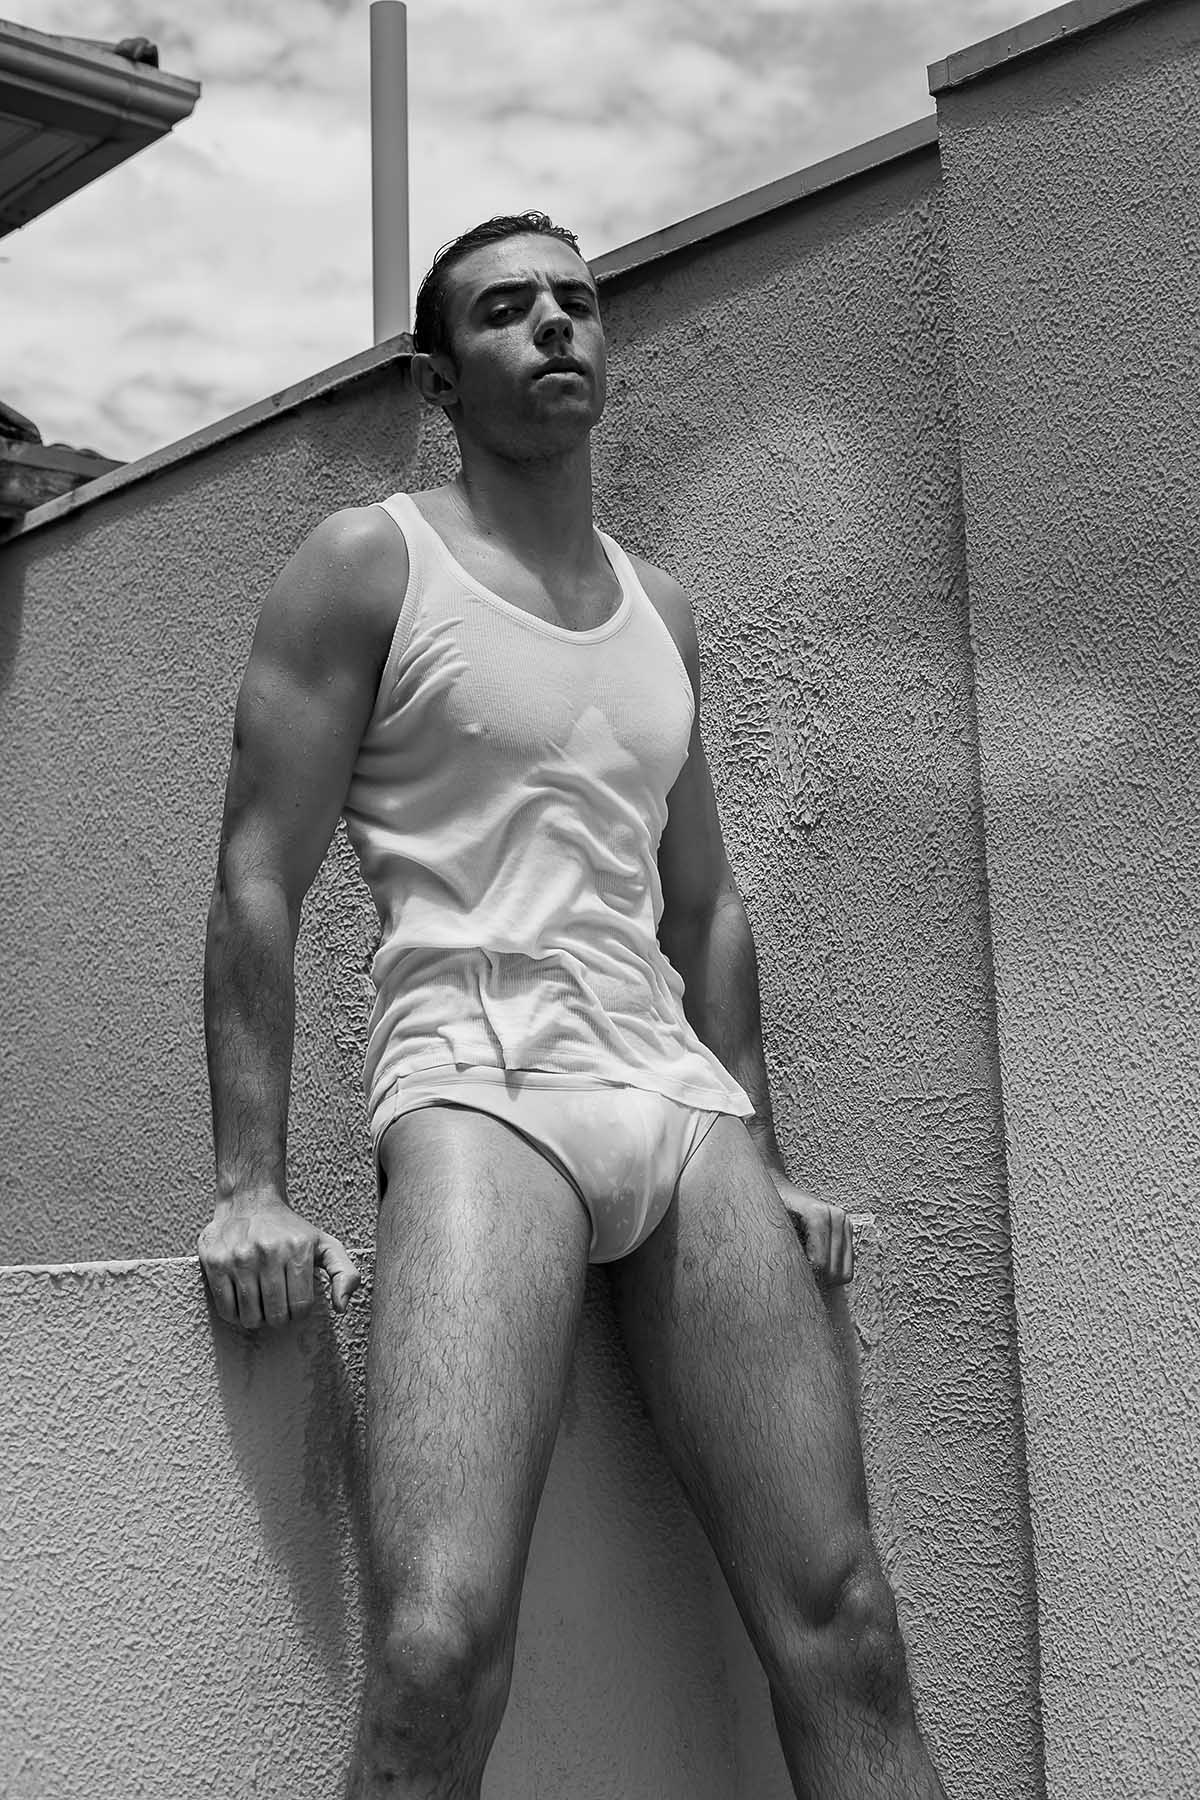 Luiz Fernando by Thiago Martini for Brazilian Male Model